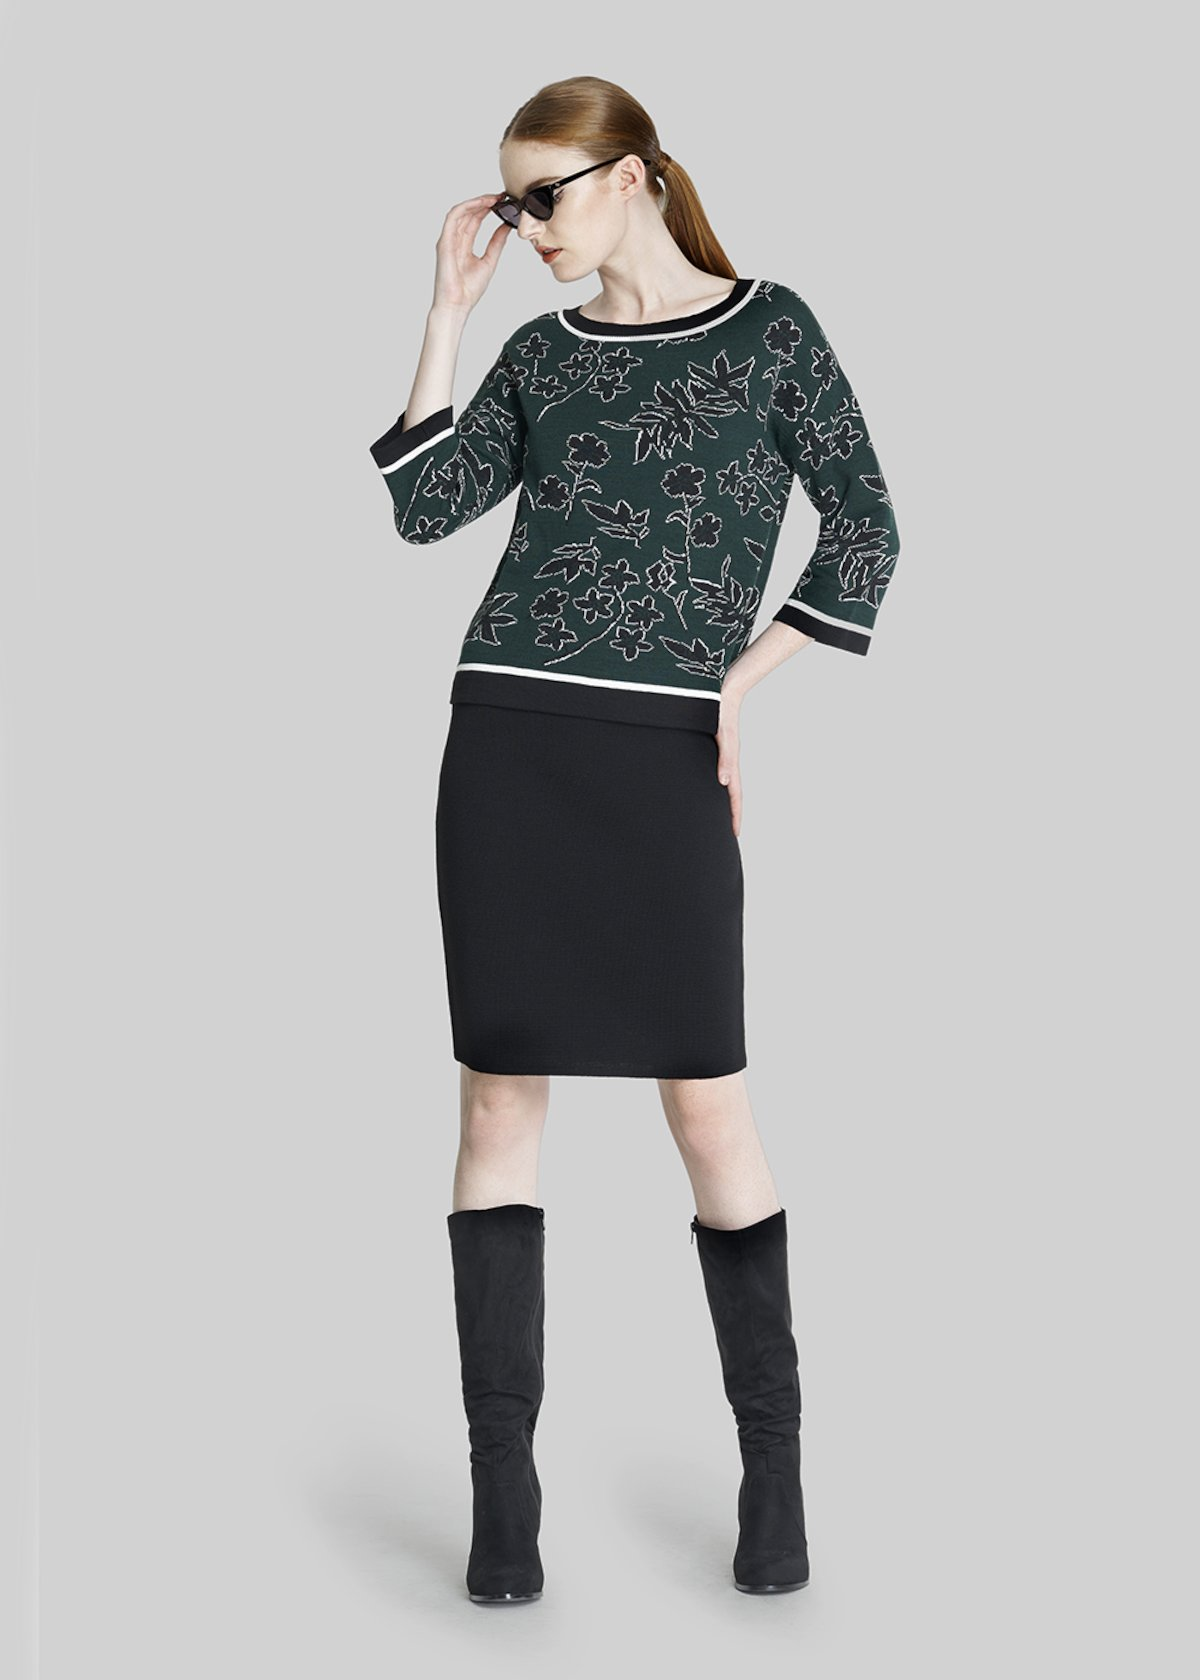 Mady 3/4 sleeve sweater - Pino / Black / Fantasia